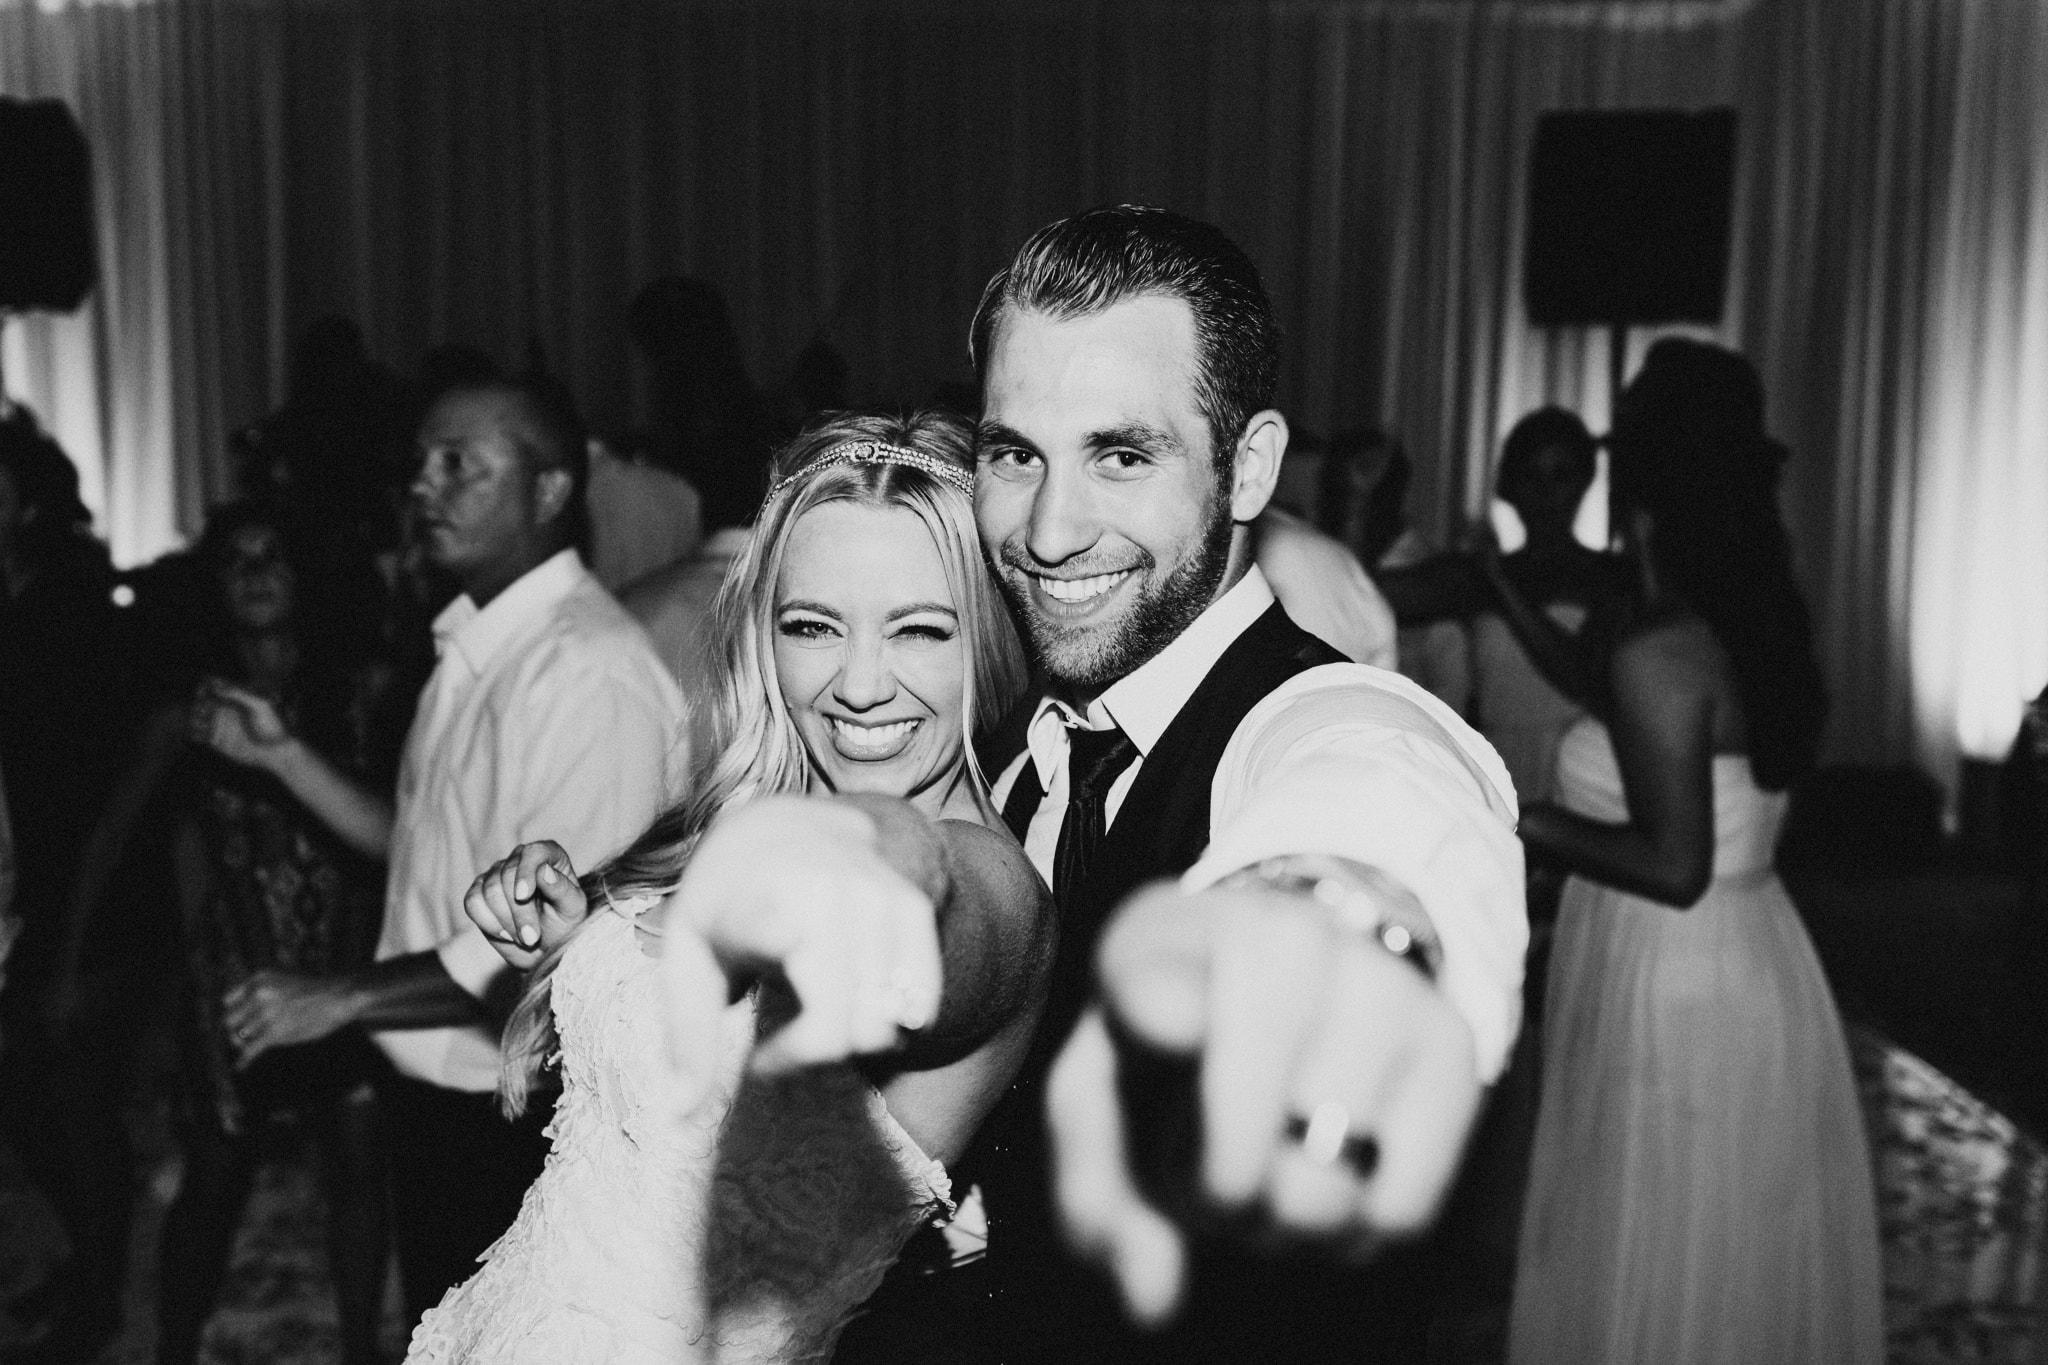 087-black-and-white-wedding-photography.jpg